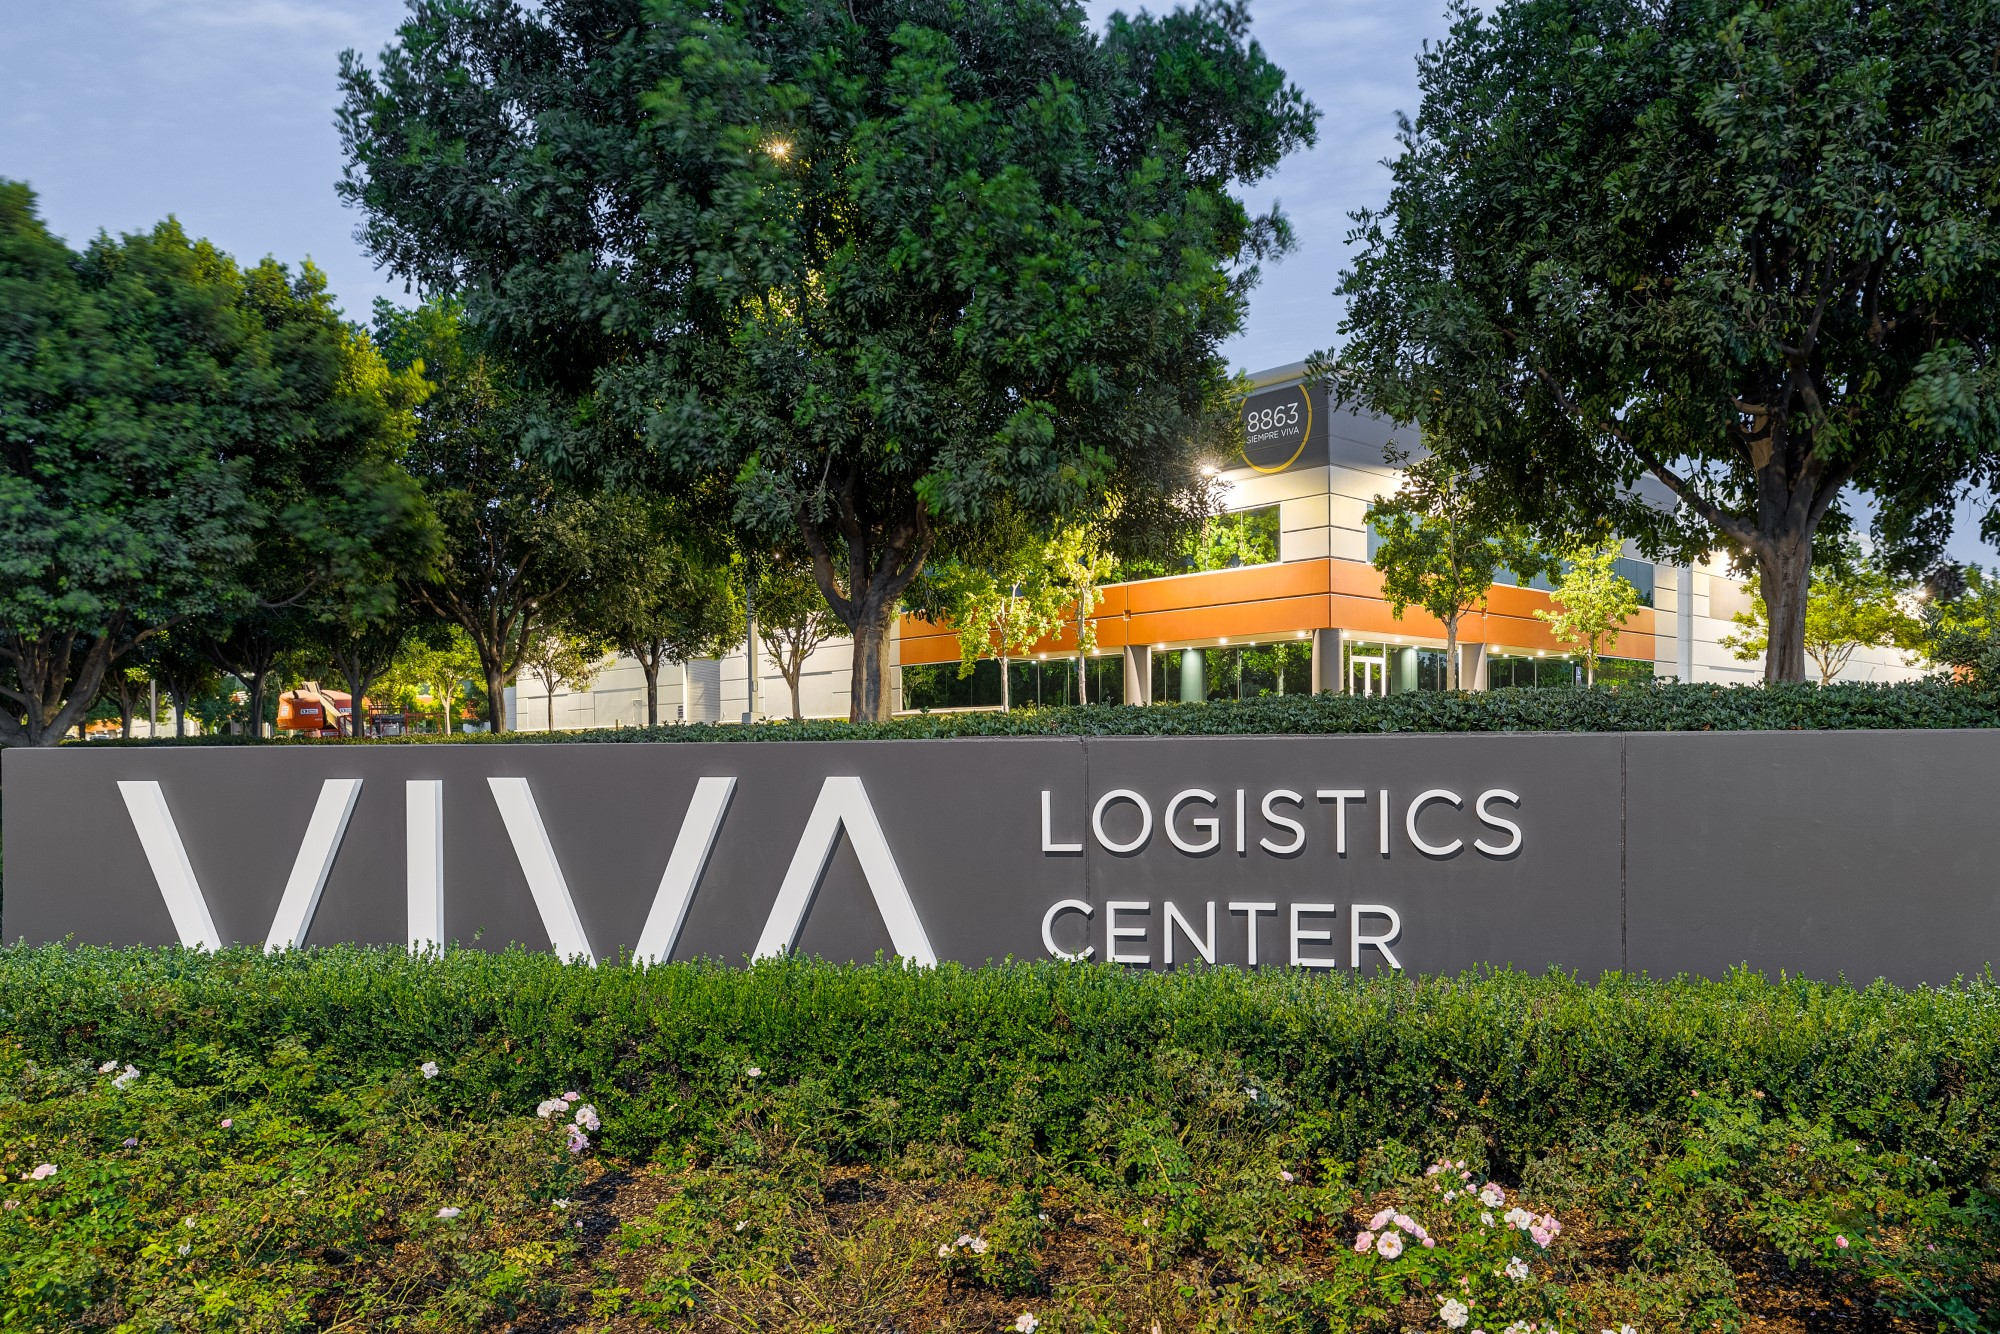 Viva_Logistics_Center_13